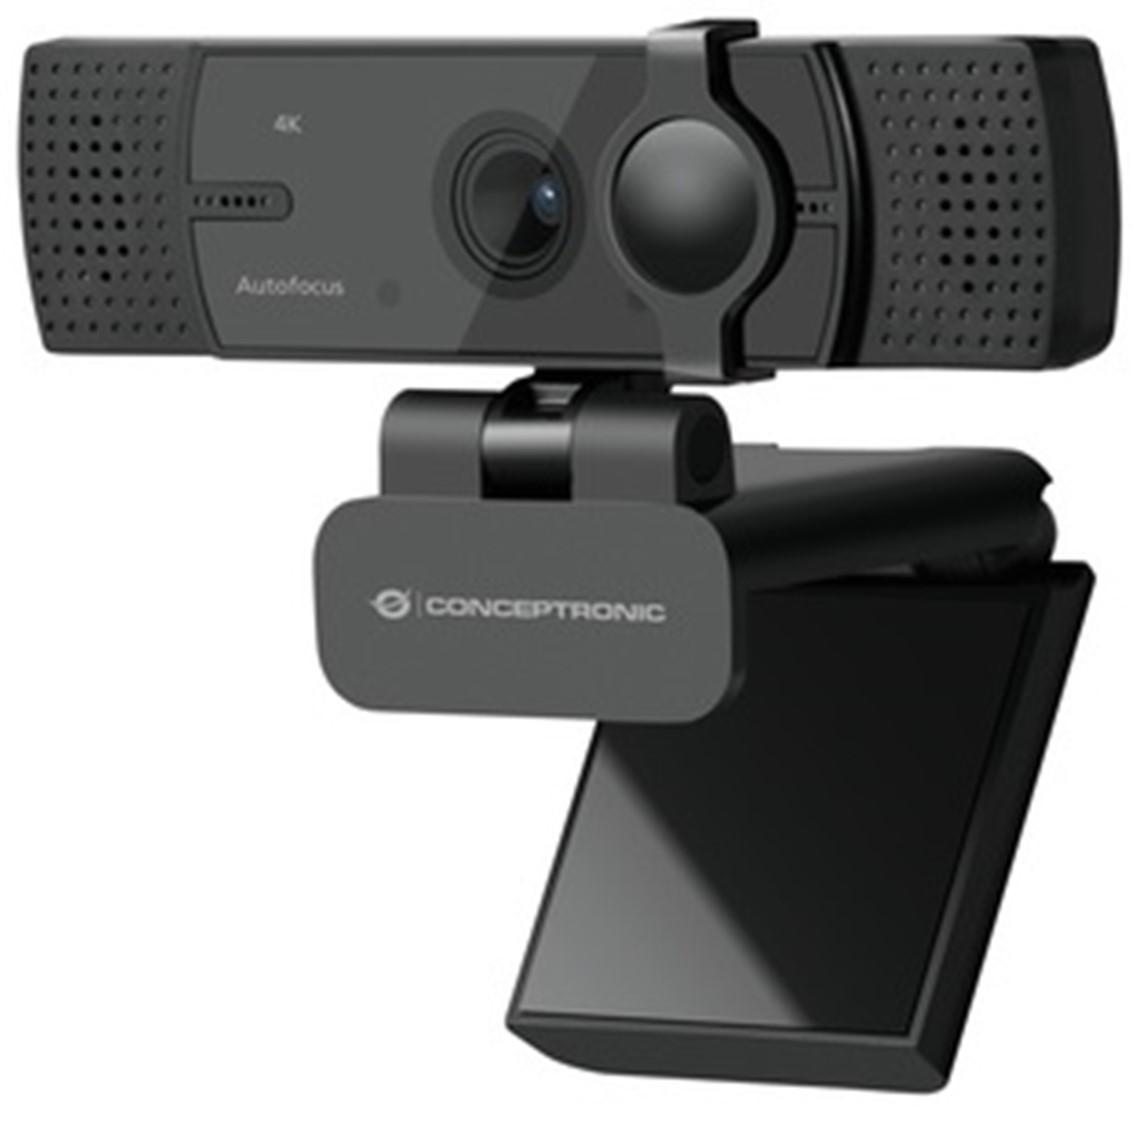 Webcam 4k conceptronic amdis08b 15.9mp -  4k ultra hd - usb - 2.26mm - angulo vision 120º - enfoque automatico - doble microfono integrado